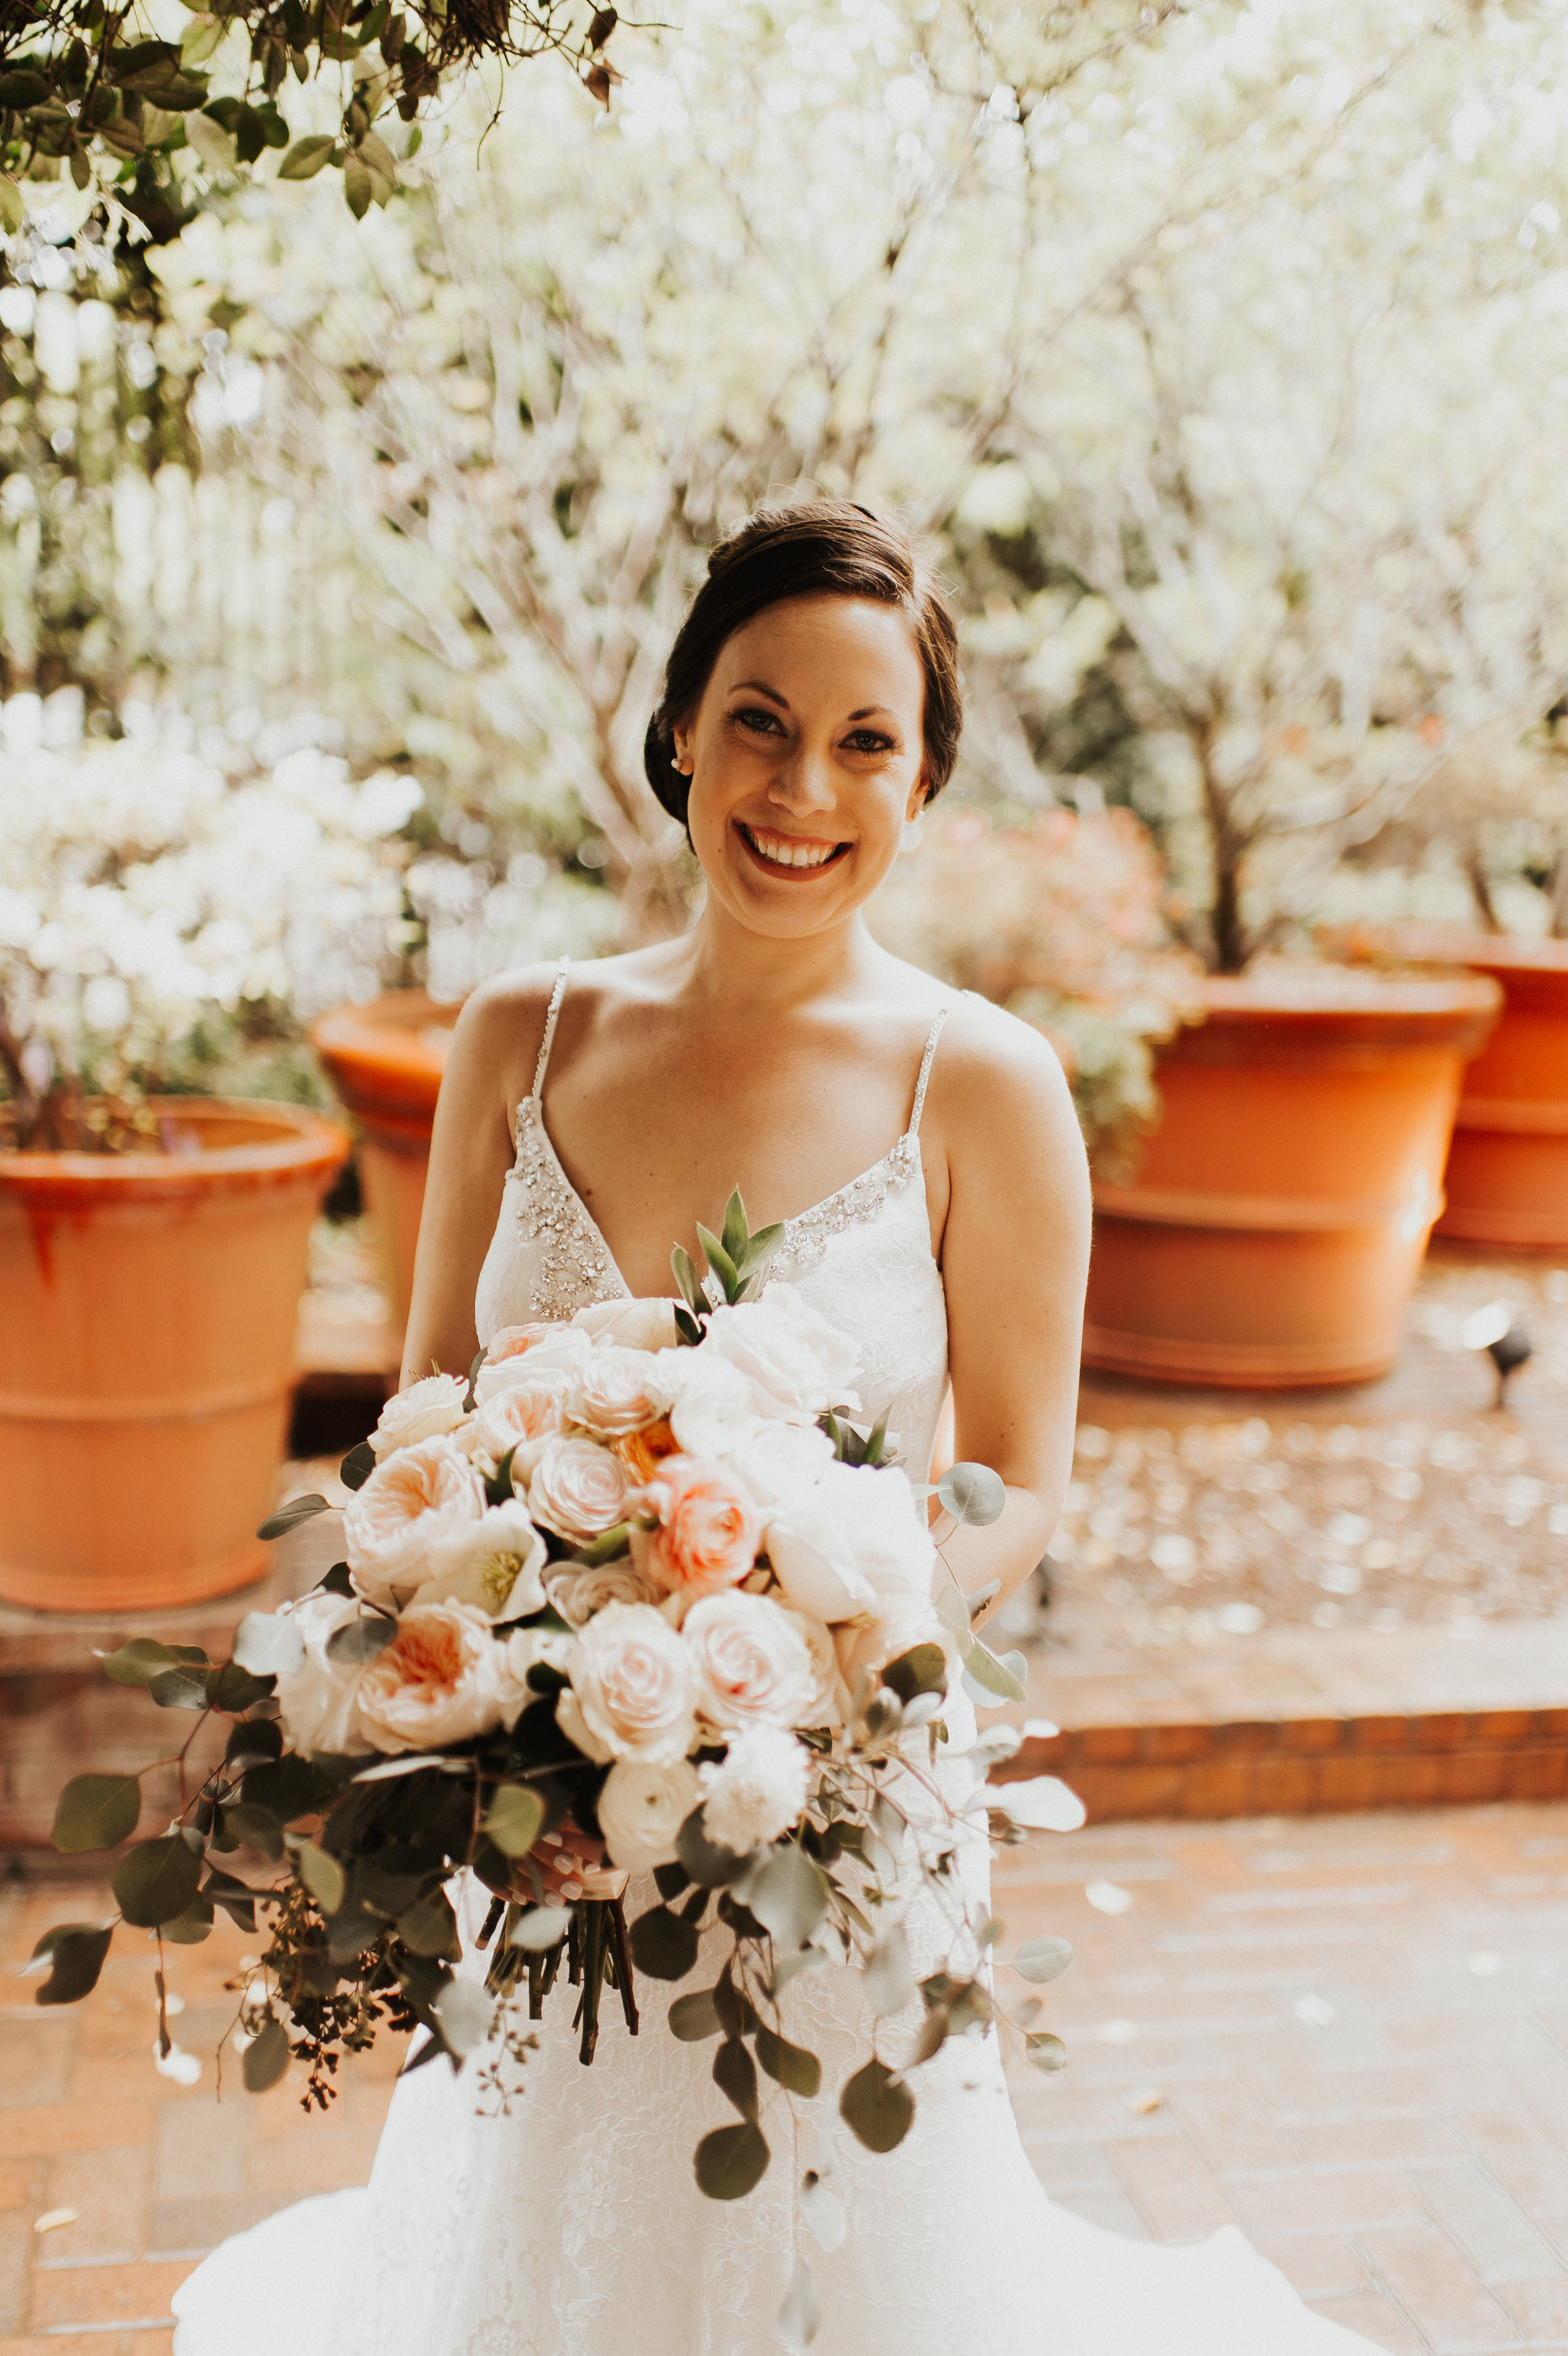 savannah-bridal-shop-andrea-and-mike-evergold-photography-georgia-state-railroad-museum-wedding-savannah-wedding-florist-savannah-wedding-planner-35.jpg